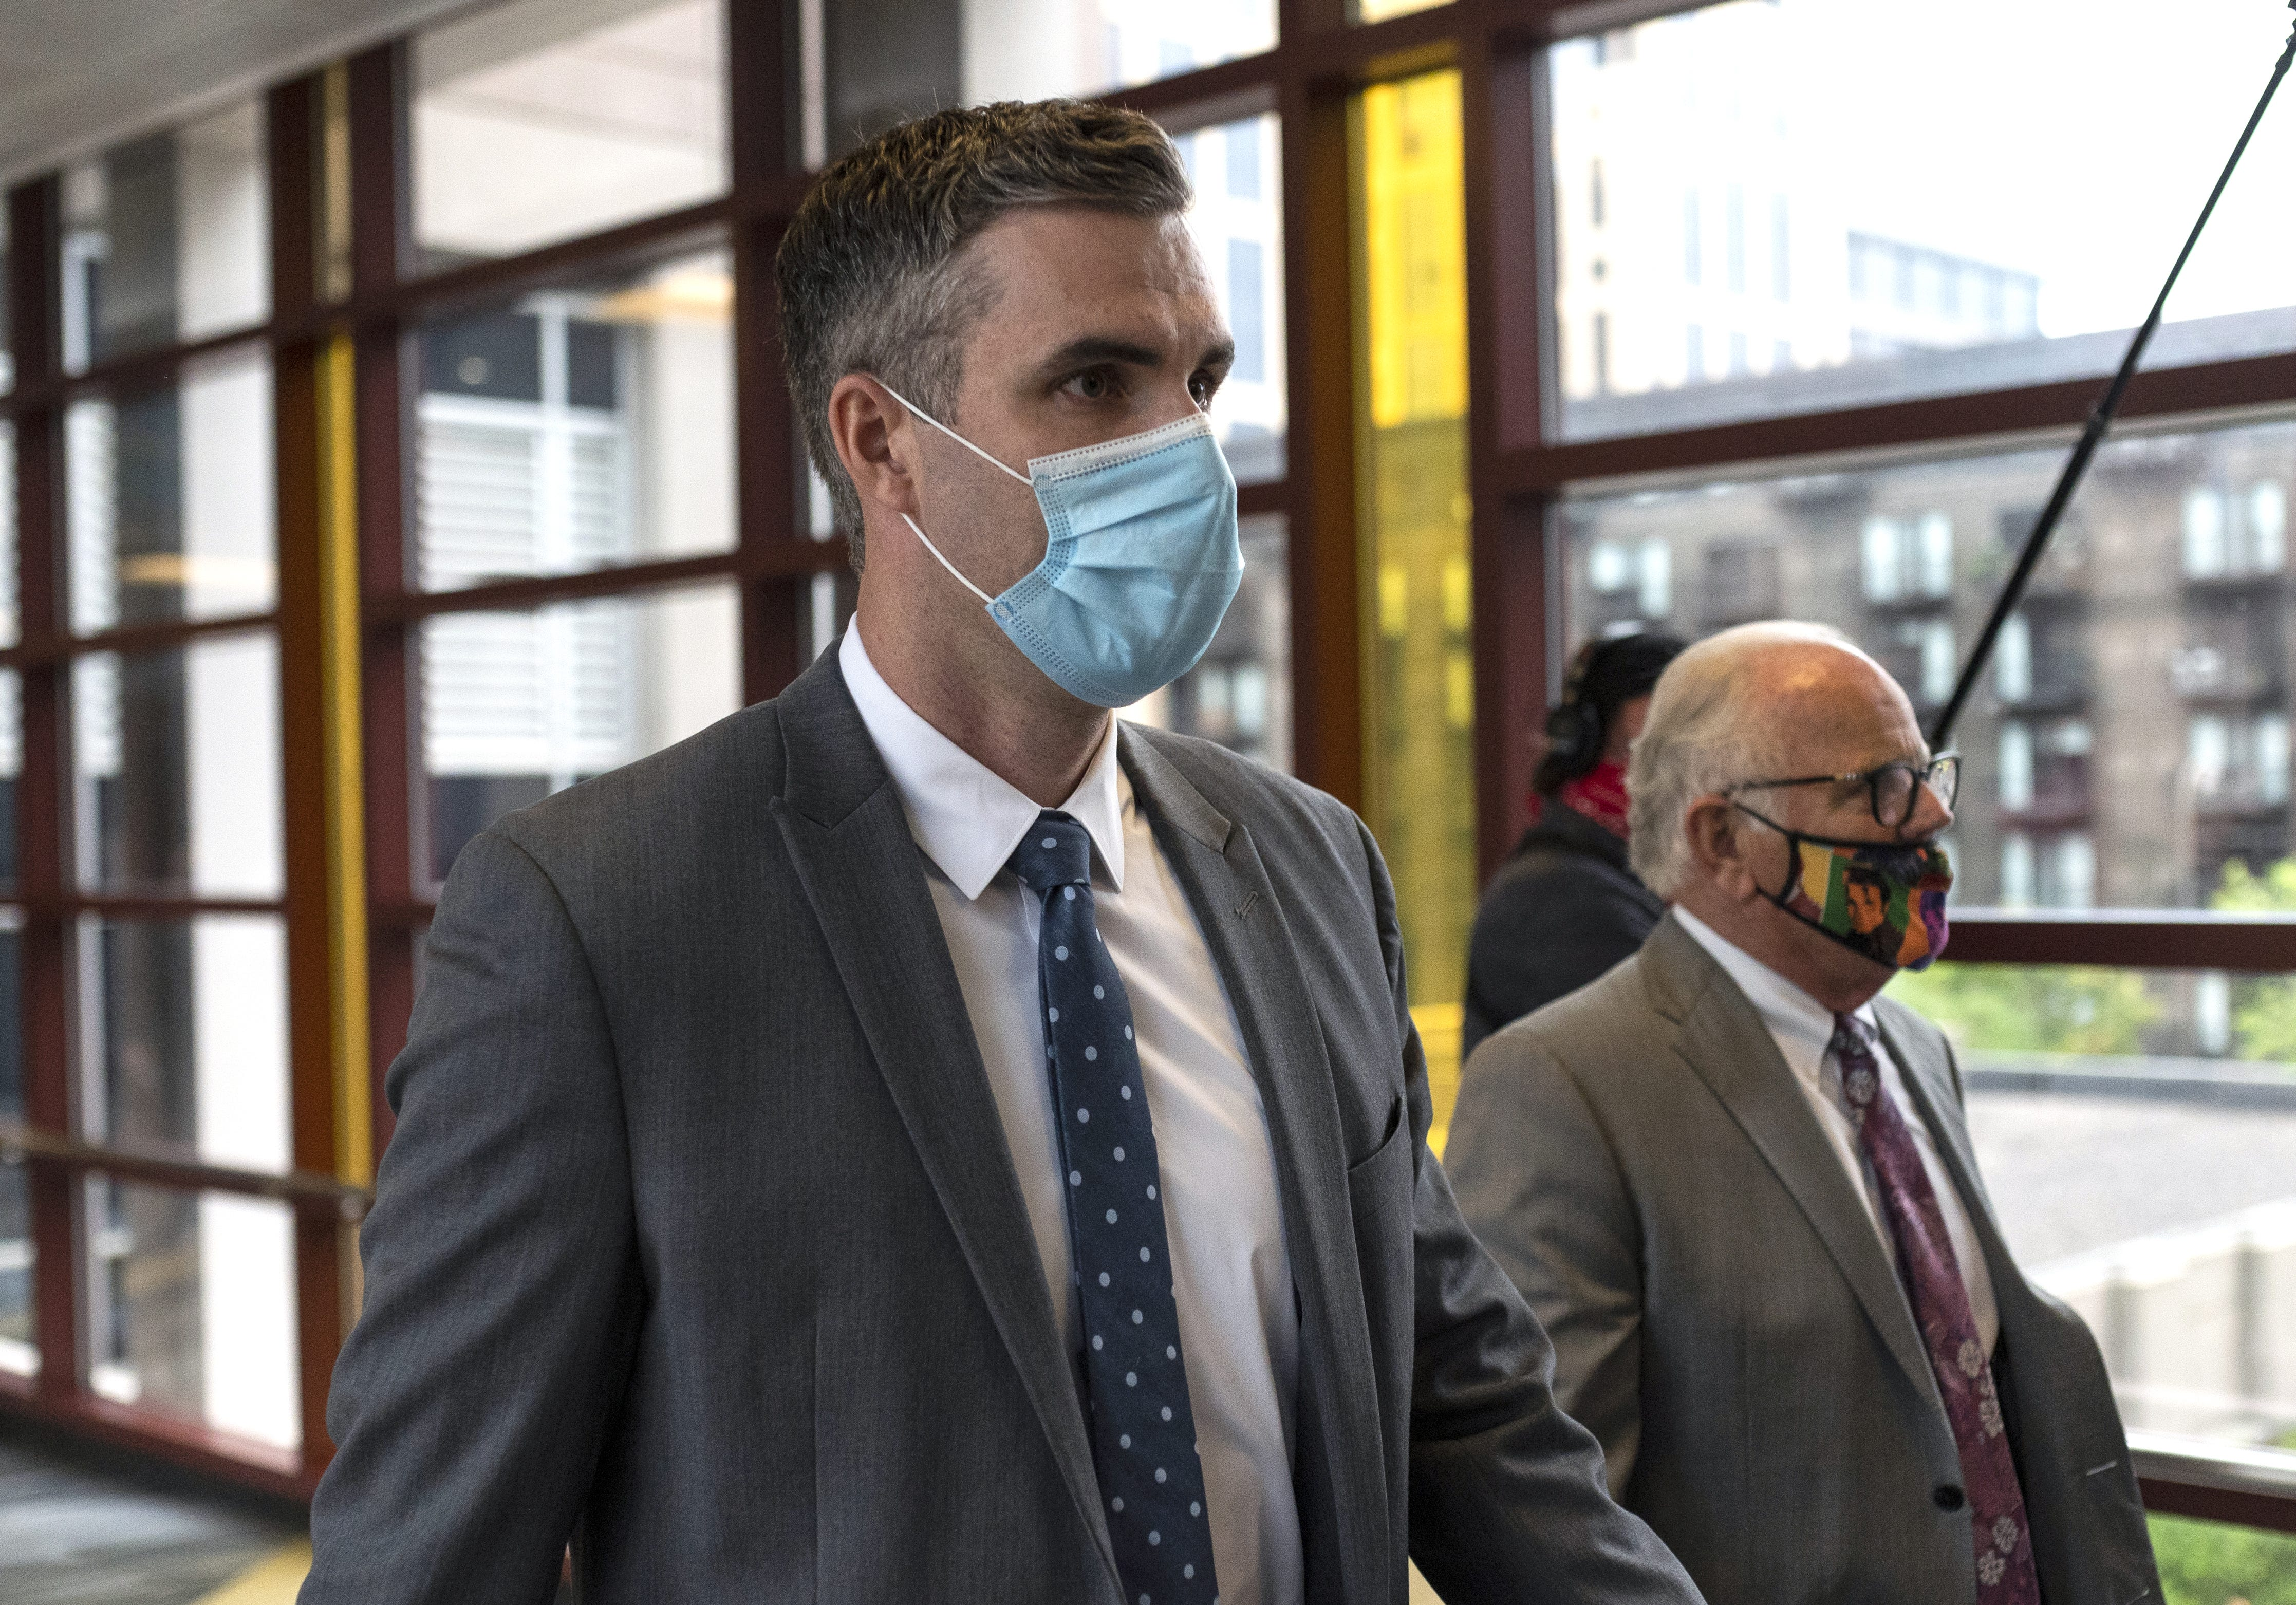 Thomas Lane, former Minneapolis police officer who held George Floyd s legs, seeks dismissal of charges